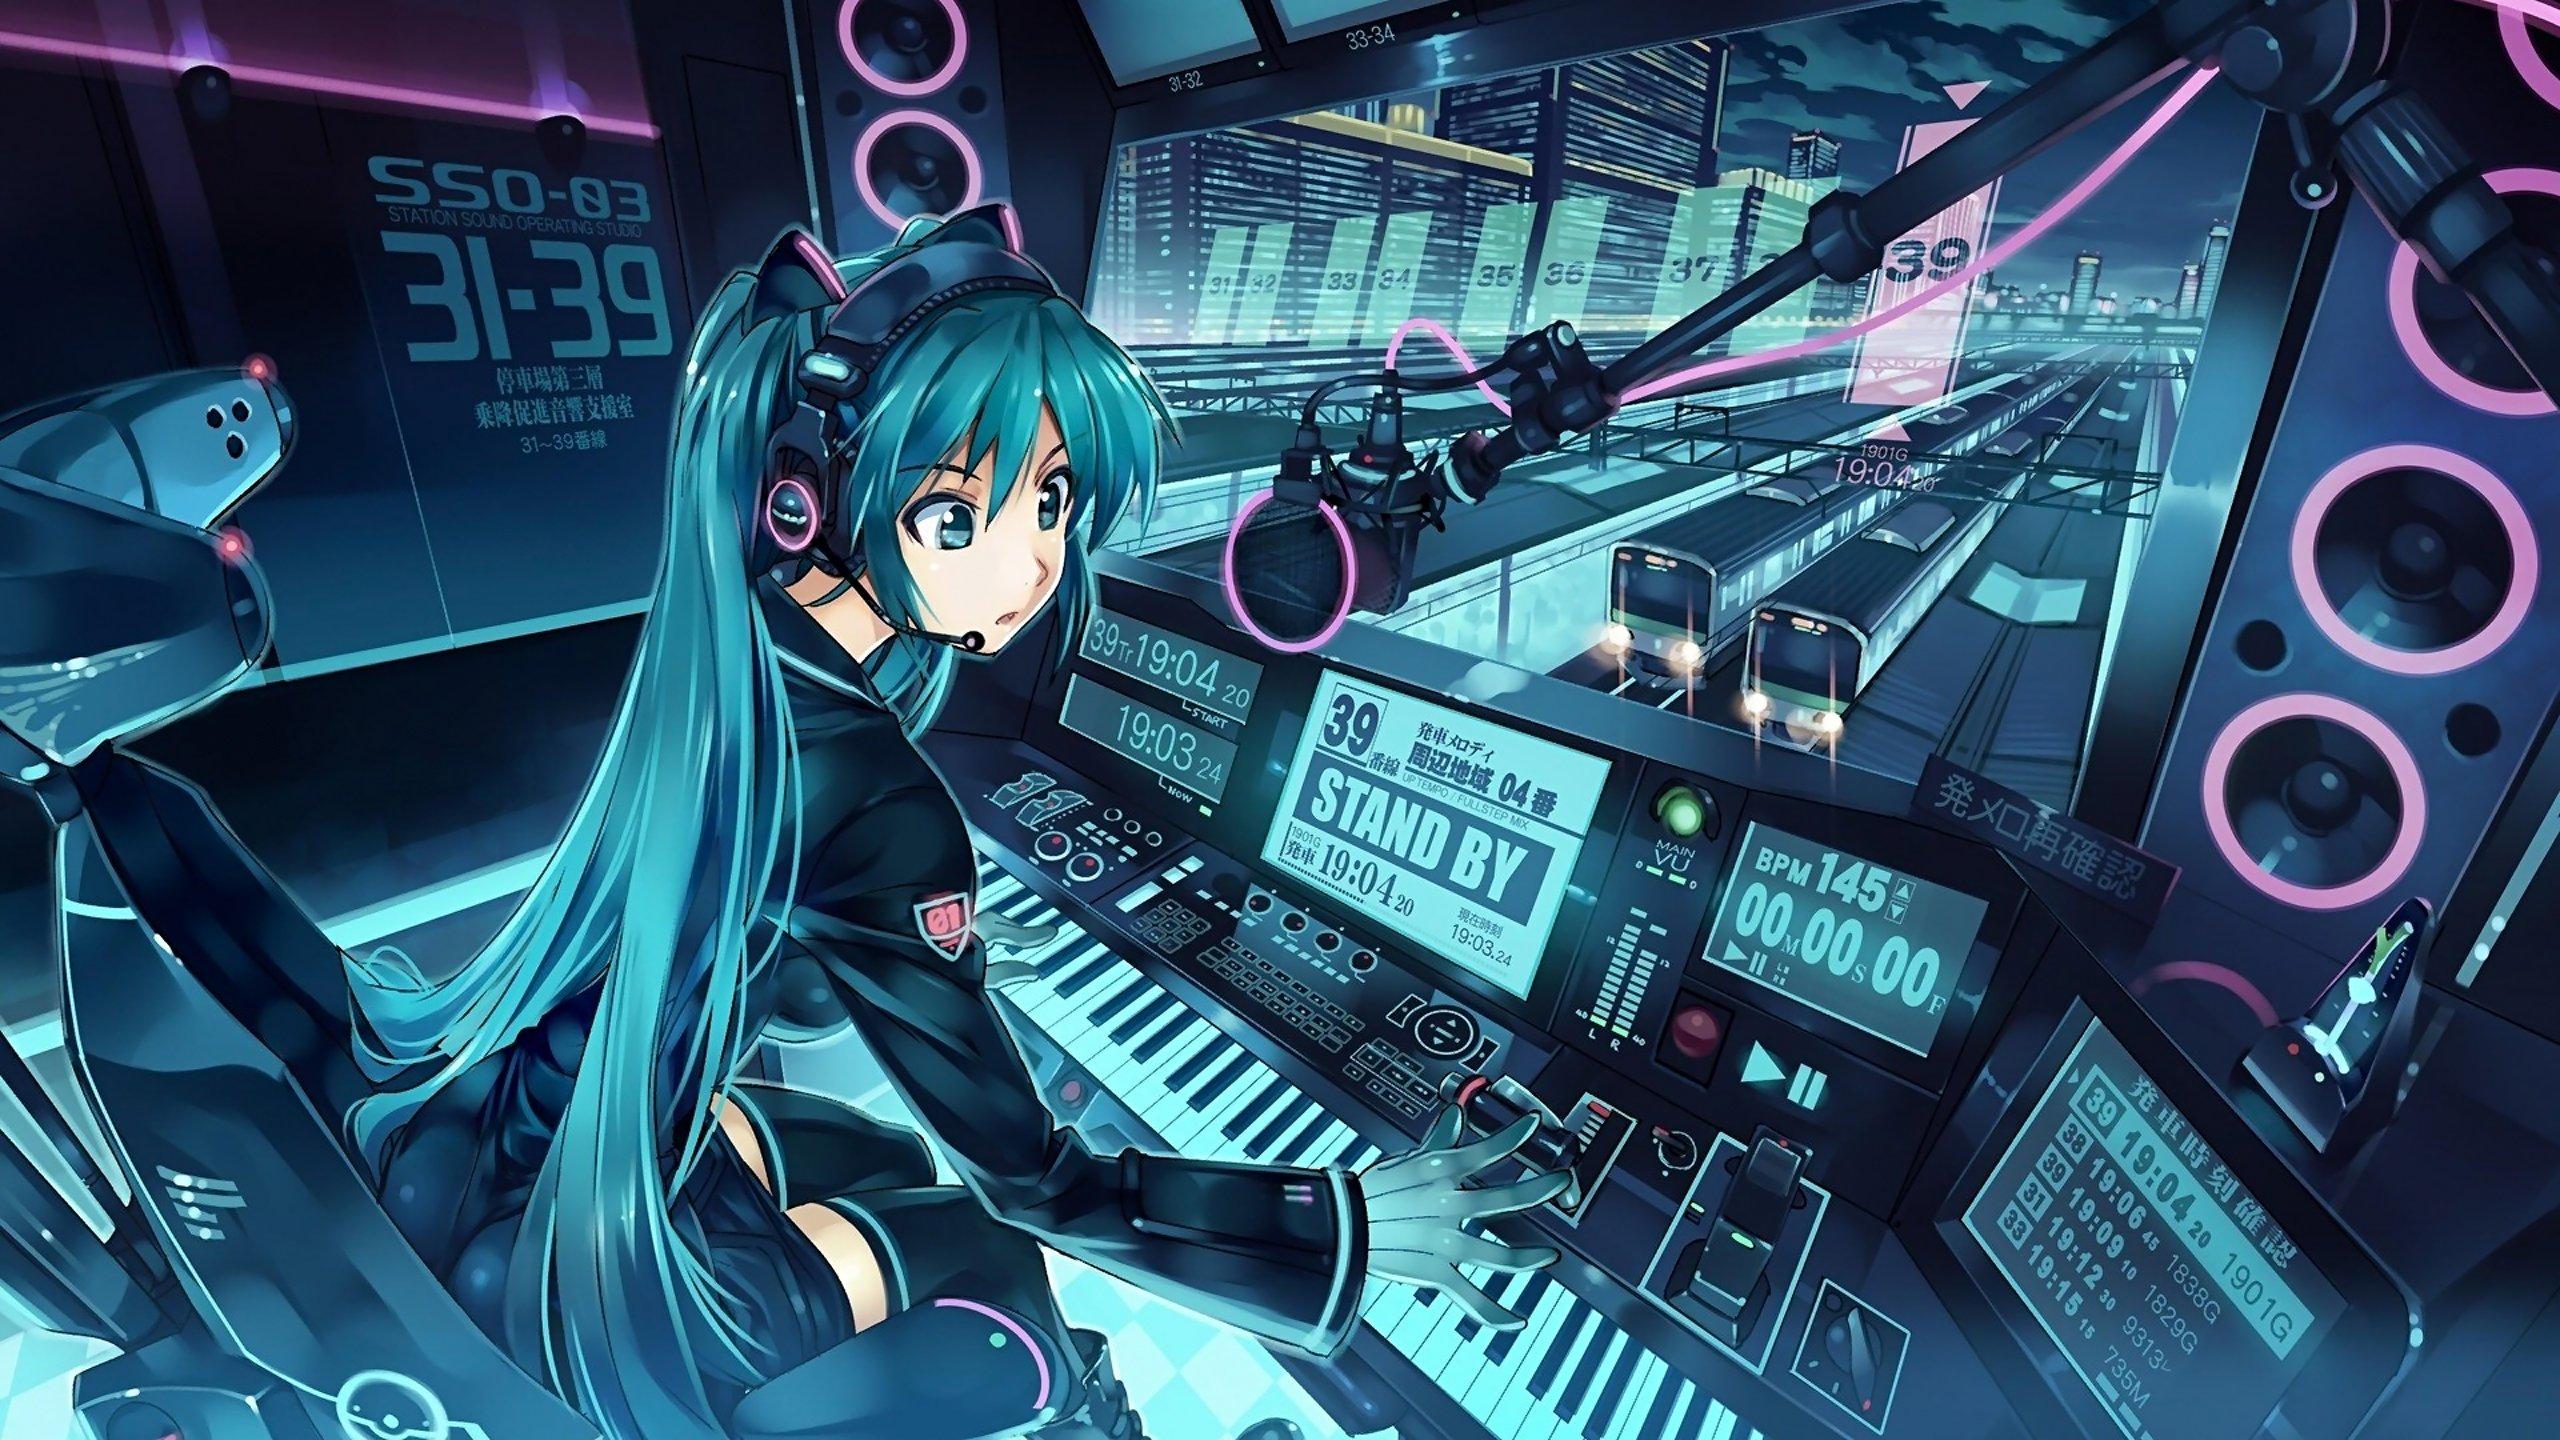 Fondos de pantalla Hatsune Miku Chica anime musica DJ